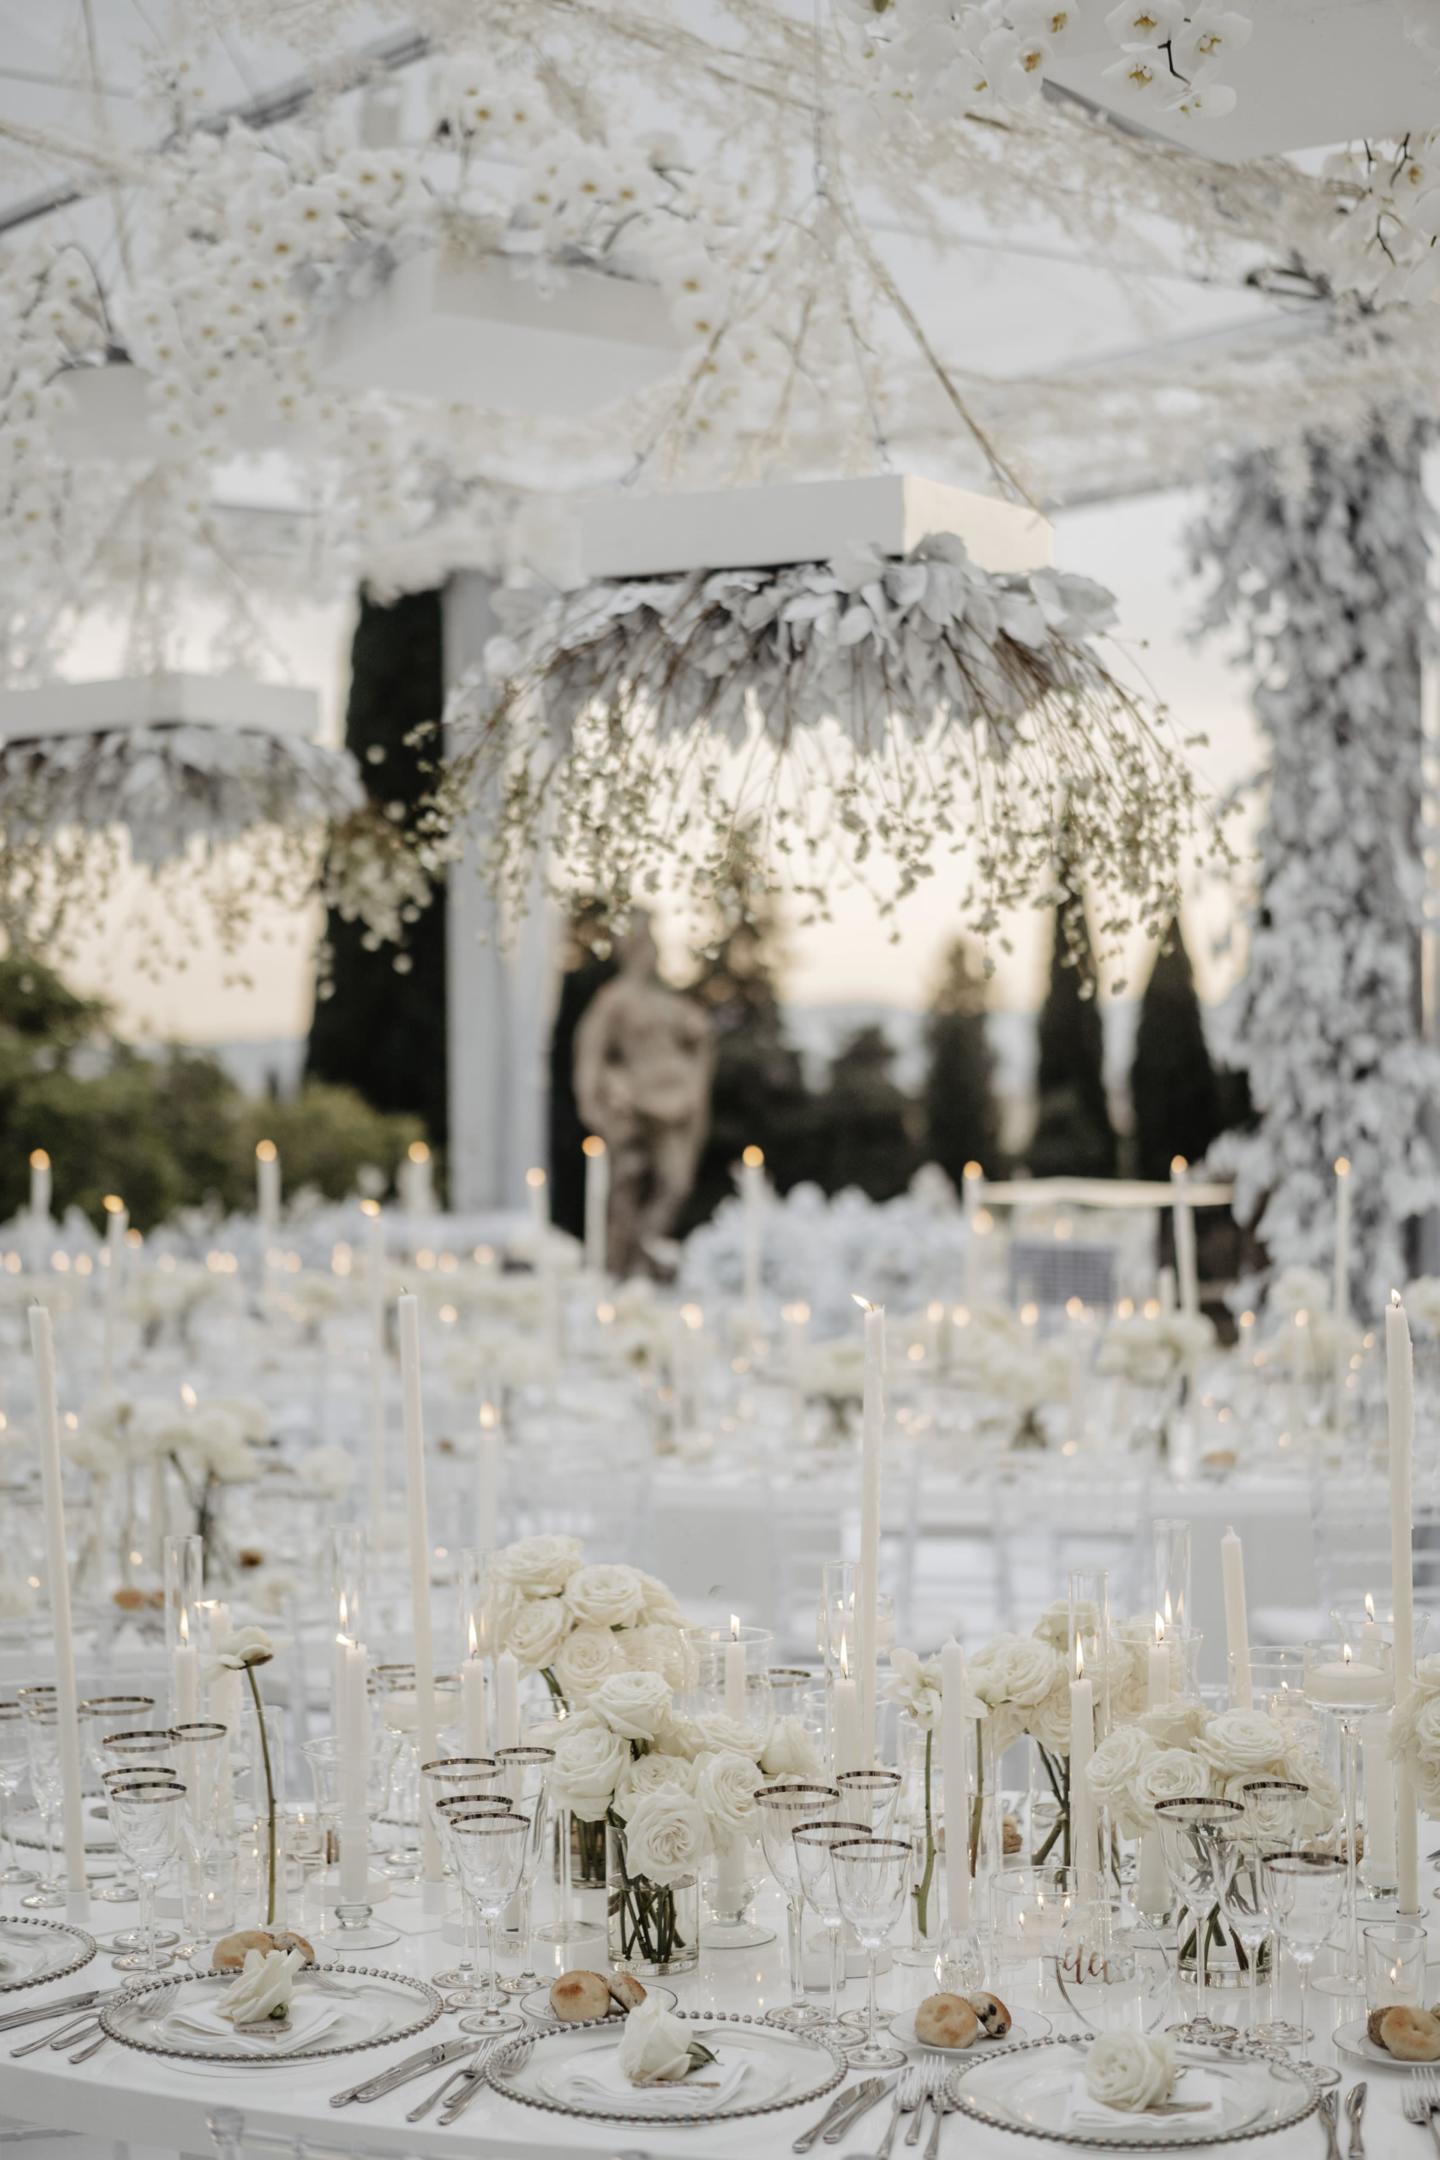 A sparkling wedding in the shore of the Arno - 74 :: A sparkling wedding on the shore of the Arno :: Luxury wedding photography - 73 :: A sparkling wedding in the shore of the Arno - 74